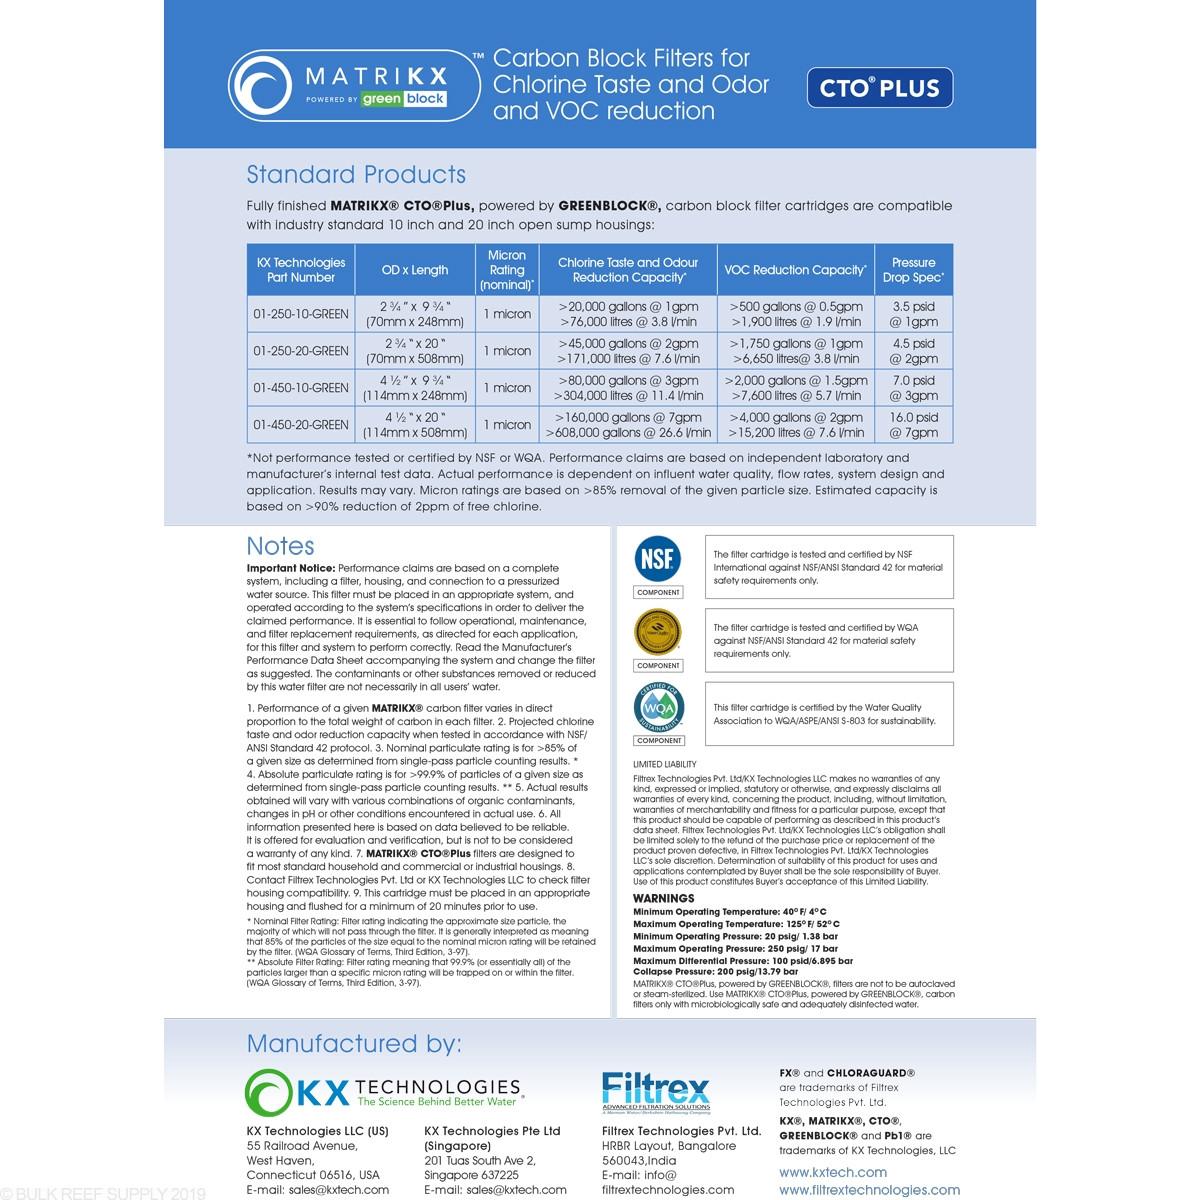 MATRIKX CTO Plus Carbon Block - 1 Micron